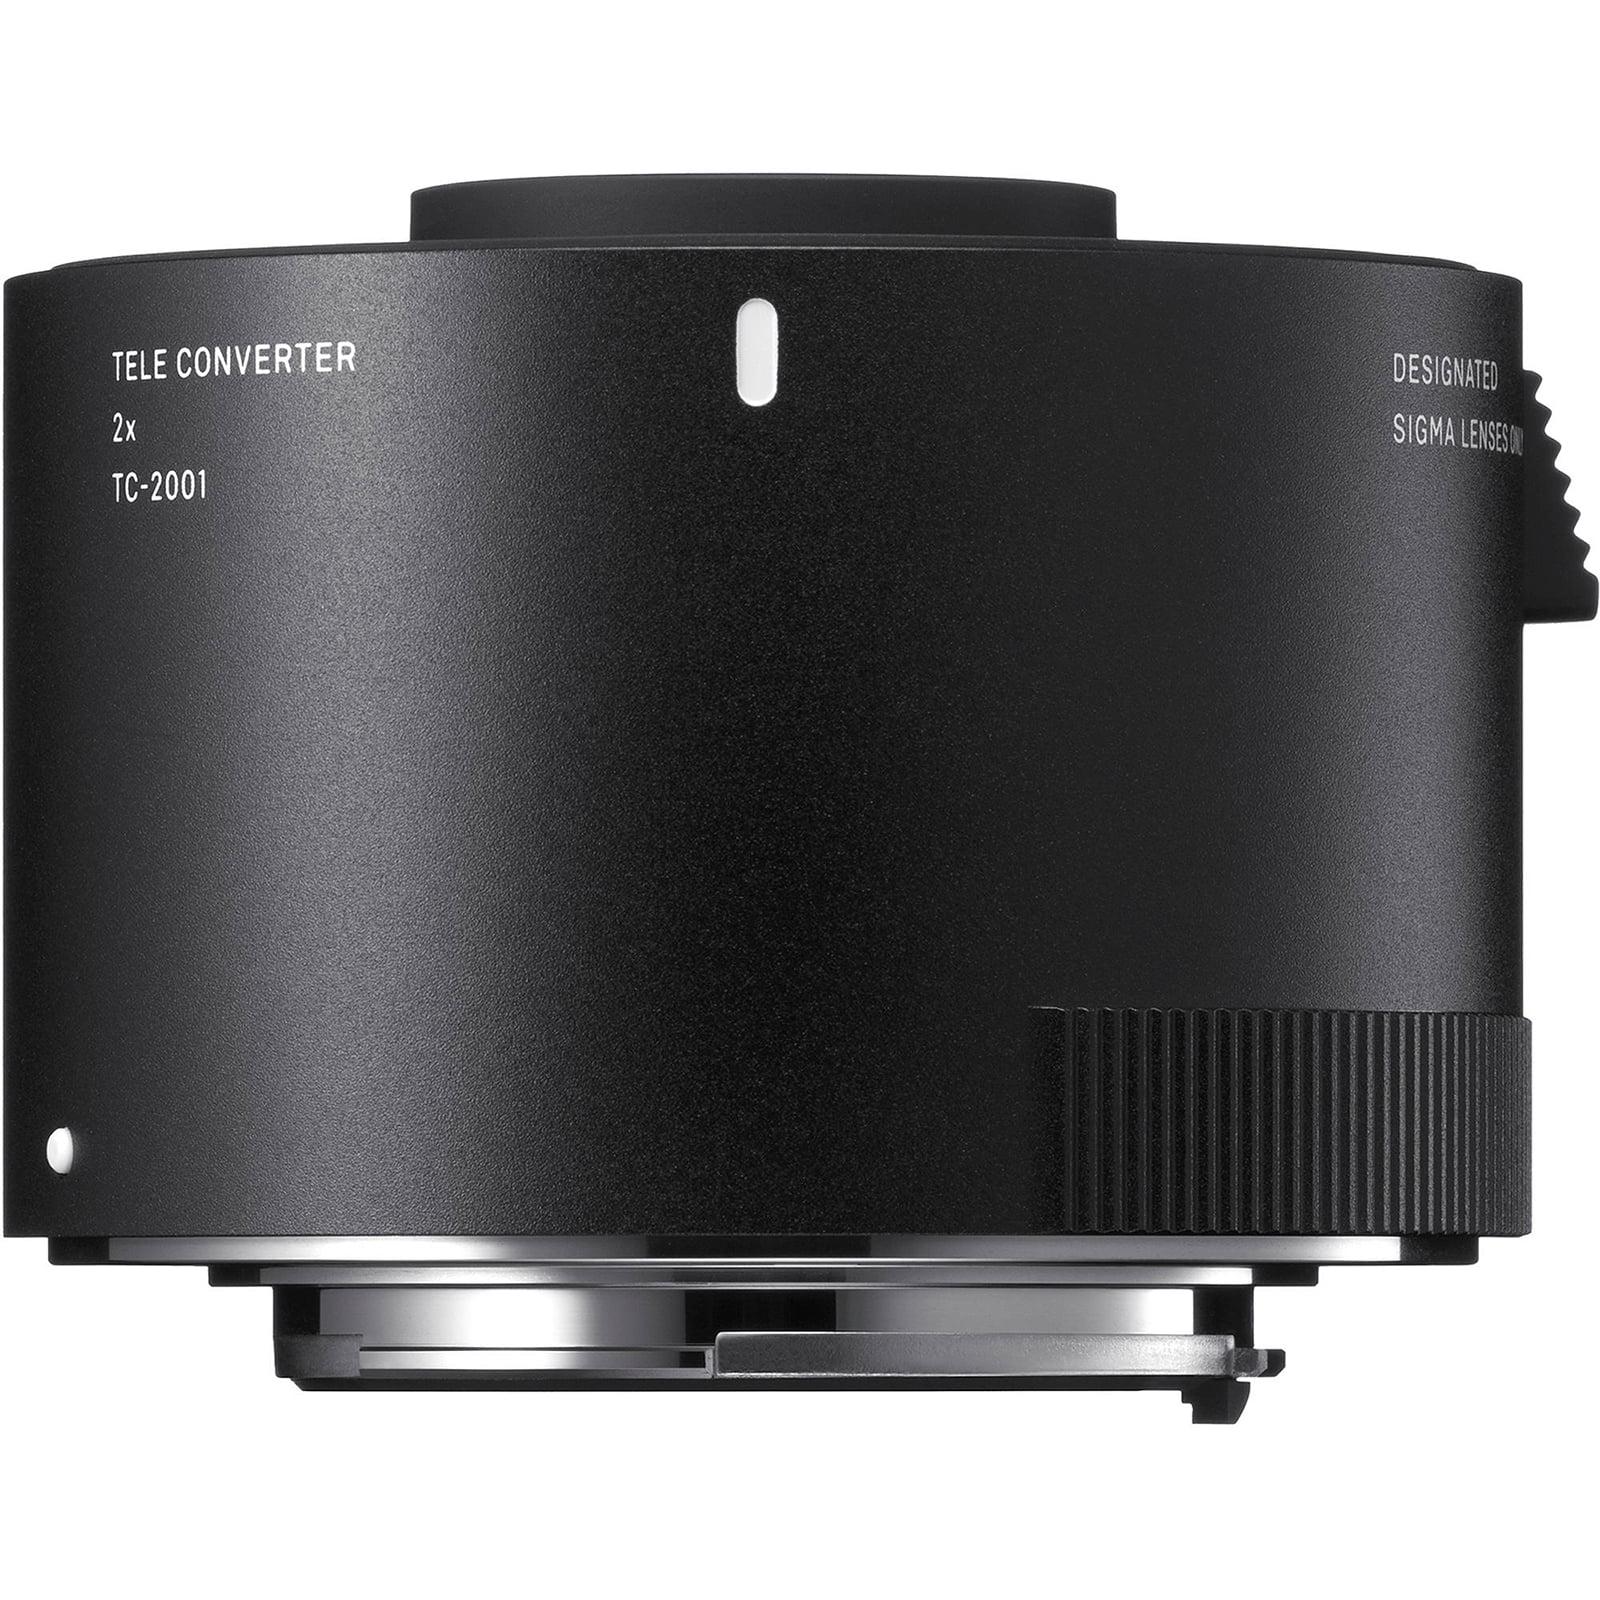 Sigma TC-2001 2x Teleconverter (for Nikon Cameras)